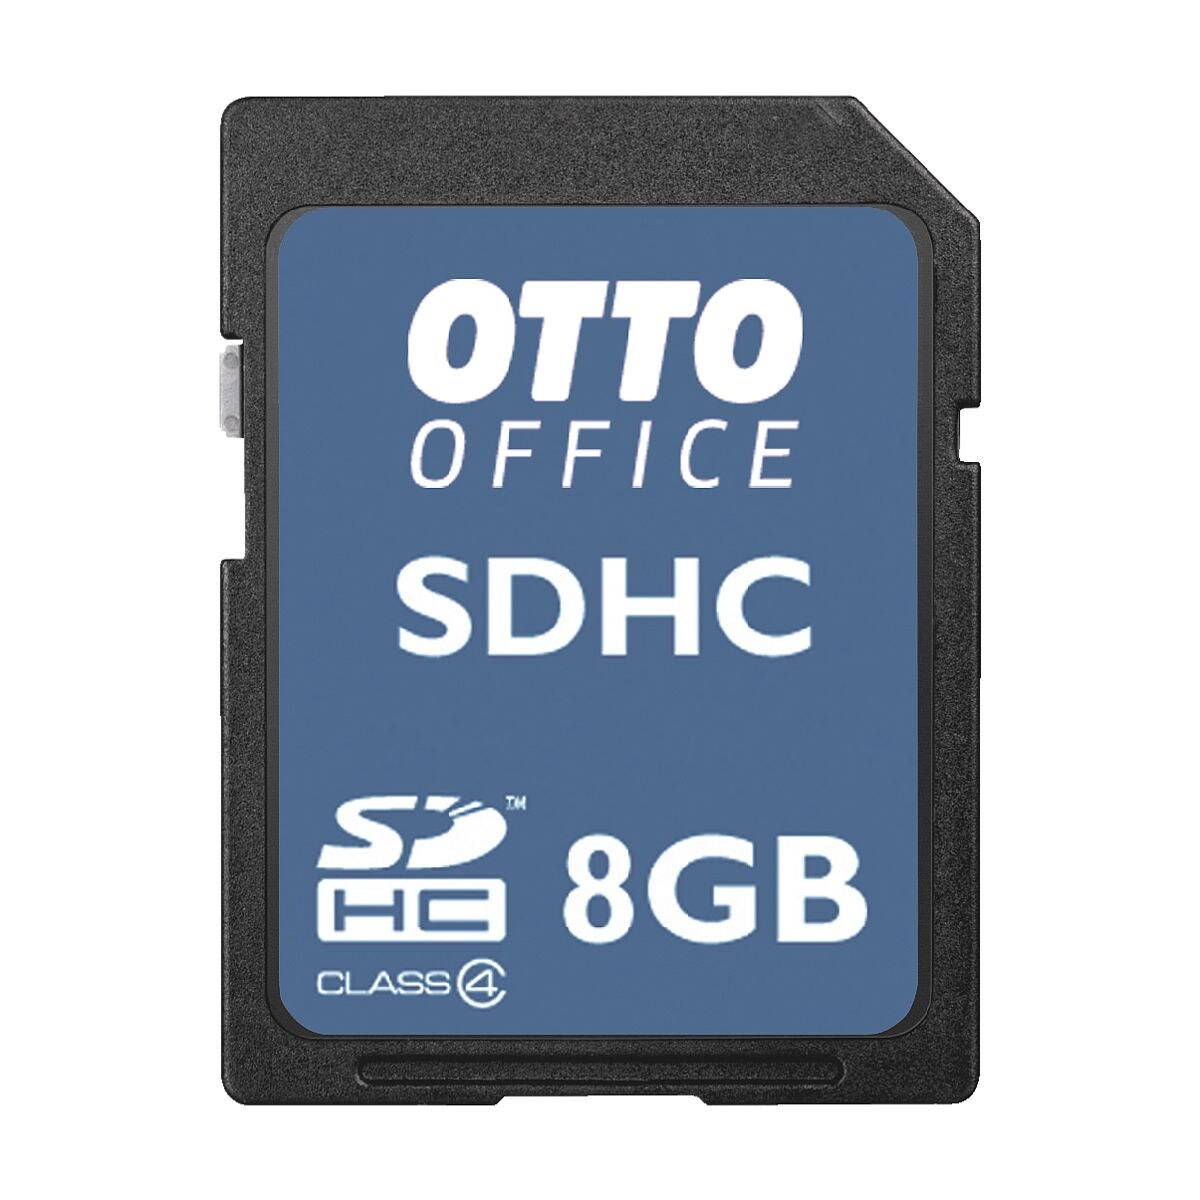 OTTO Office SDHC-Speicherkarte »8GB«